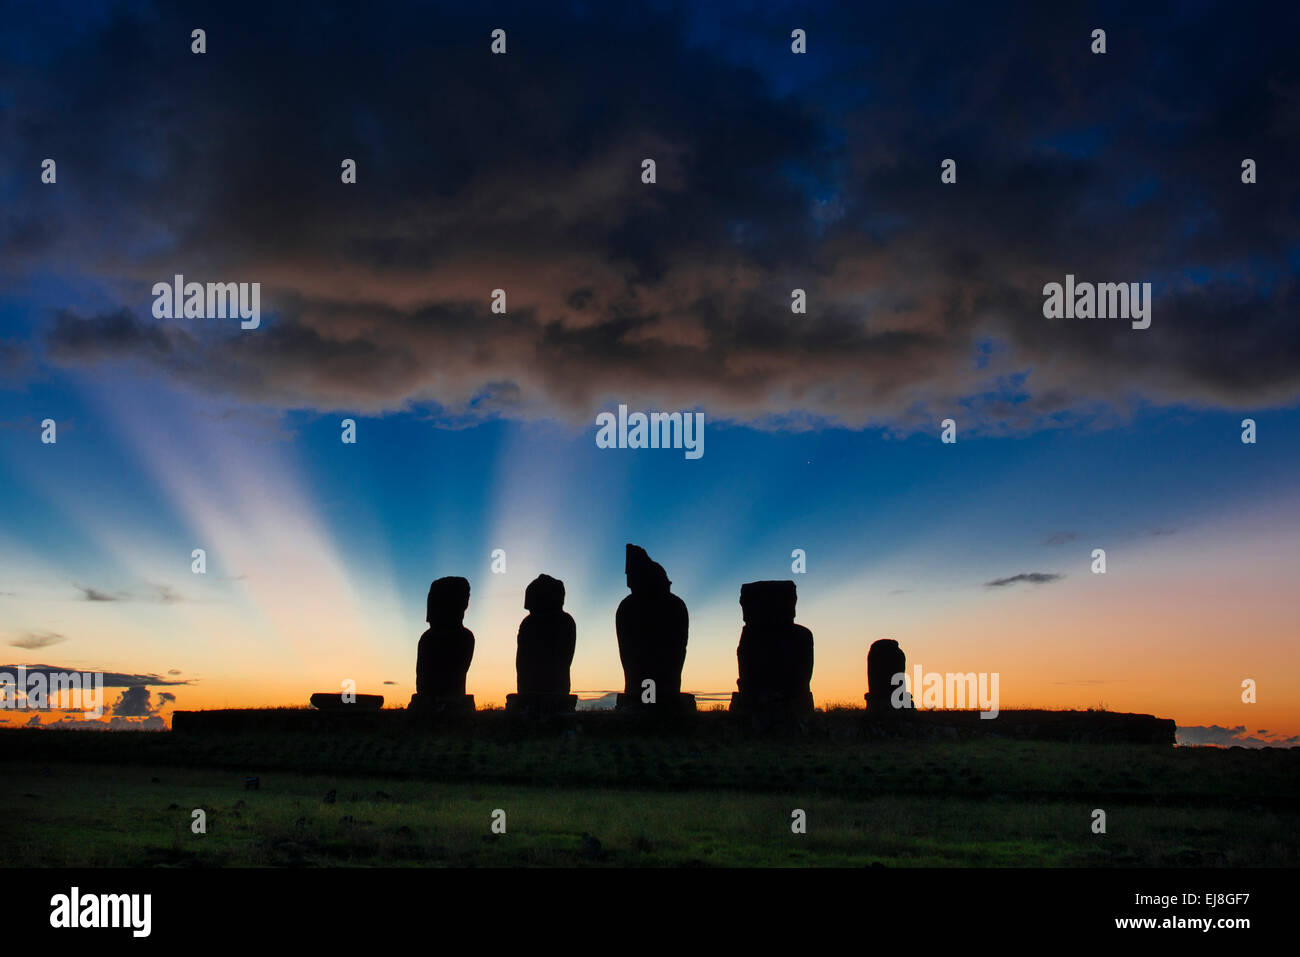 Ahu Vai Uri, Easter Island, Rapa Nui at sunset - Stock Image